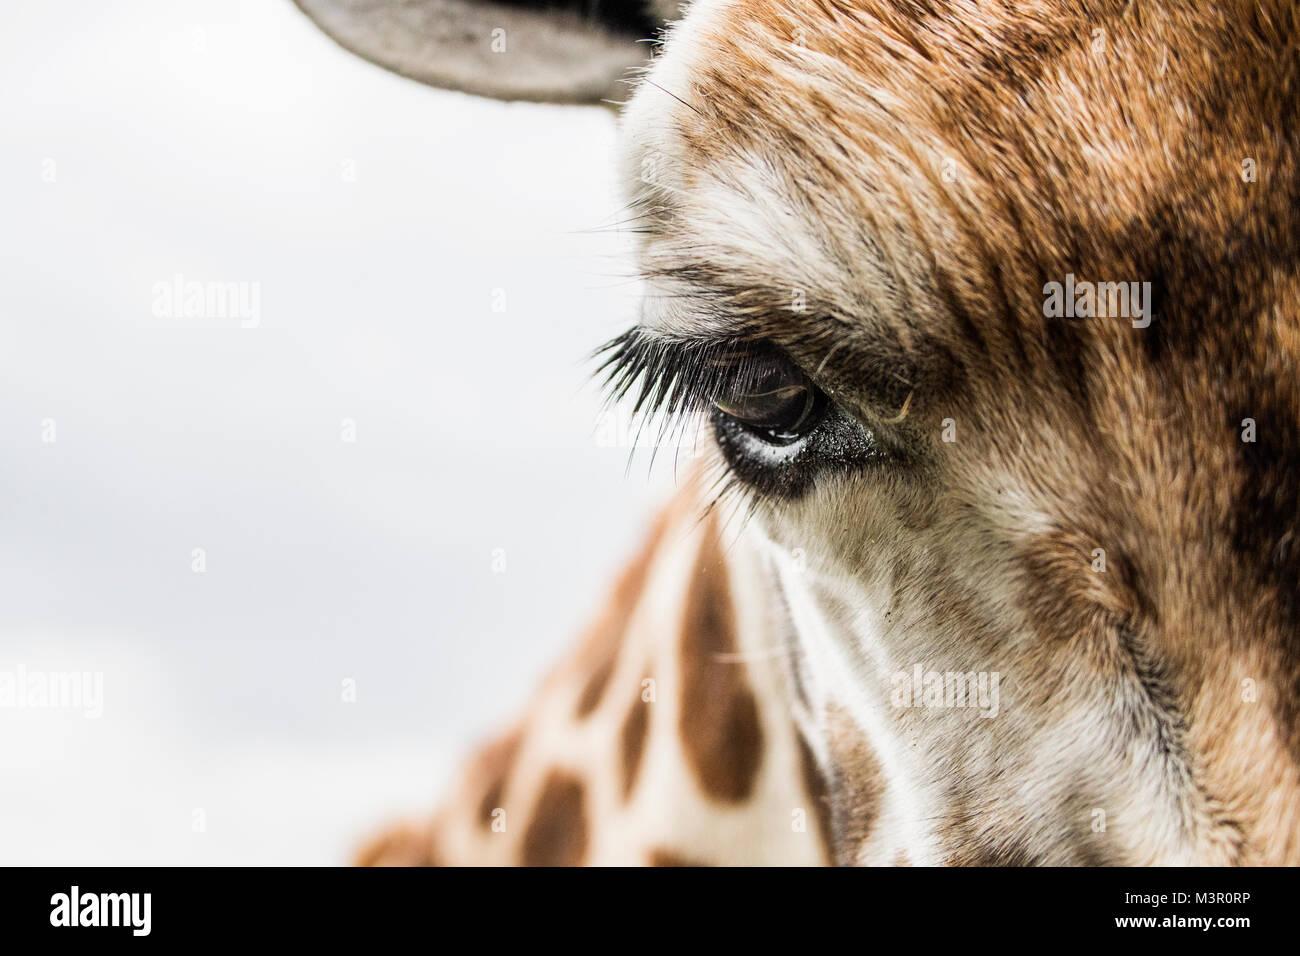 Mirando de cerca youg jirafa Imagen De Stock